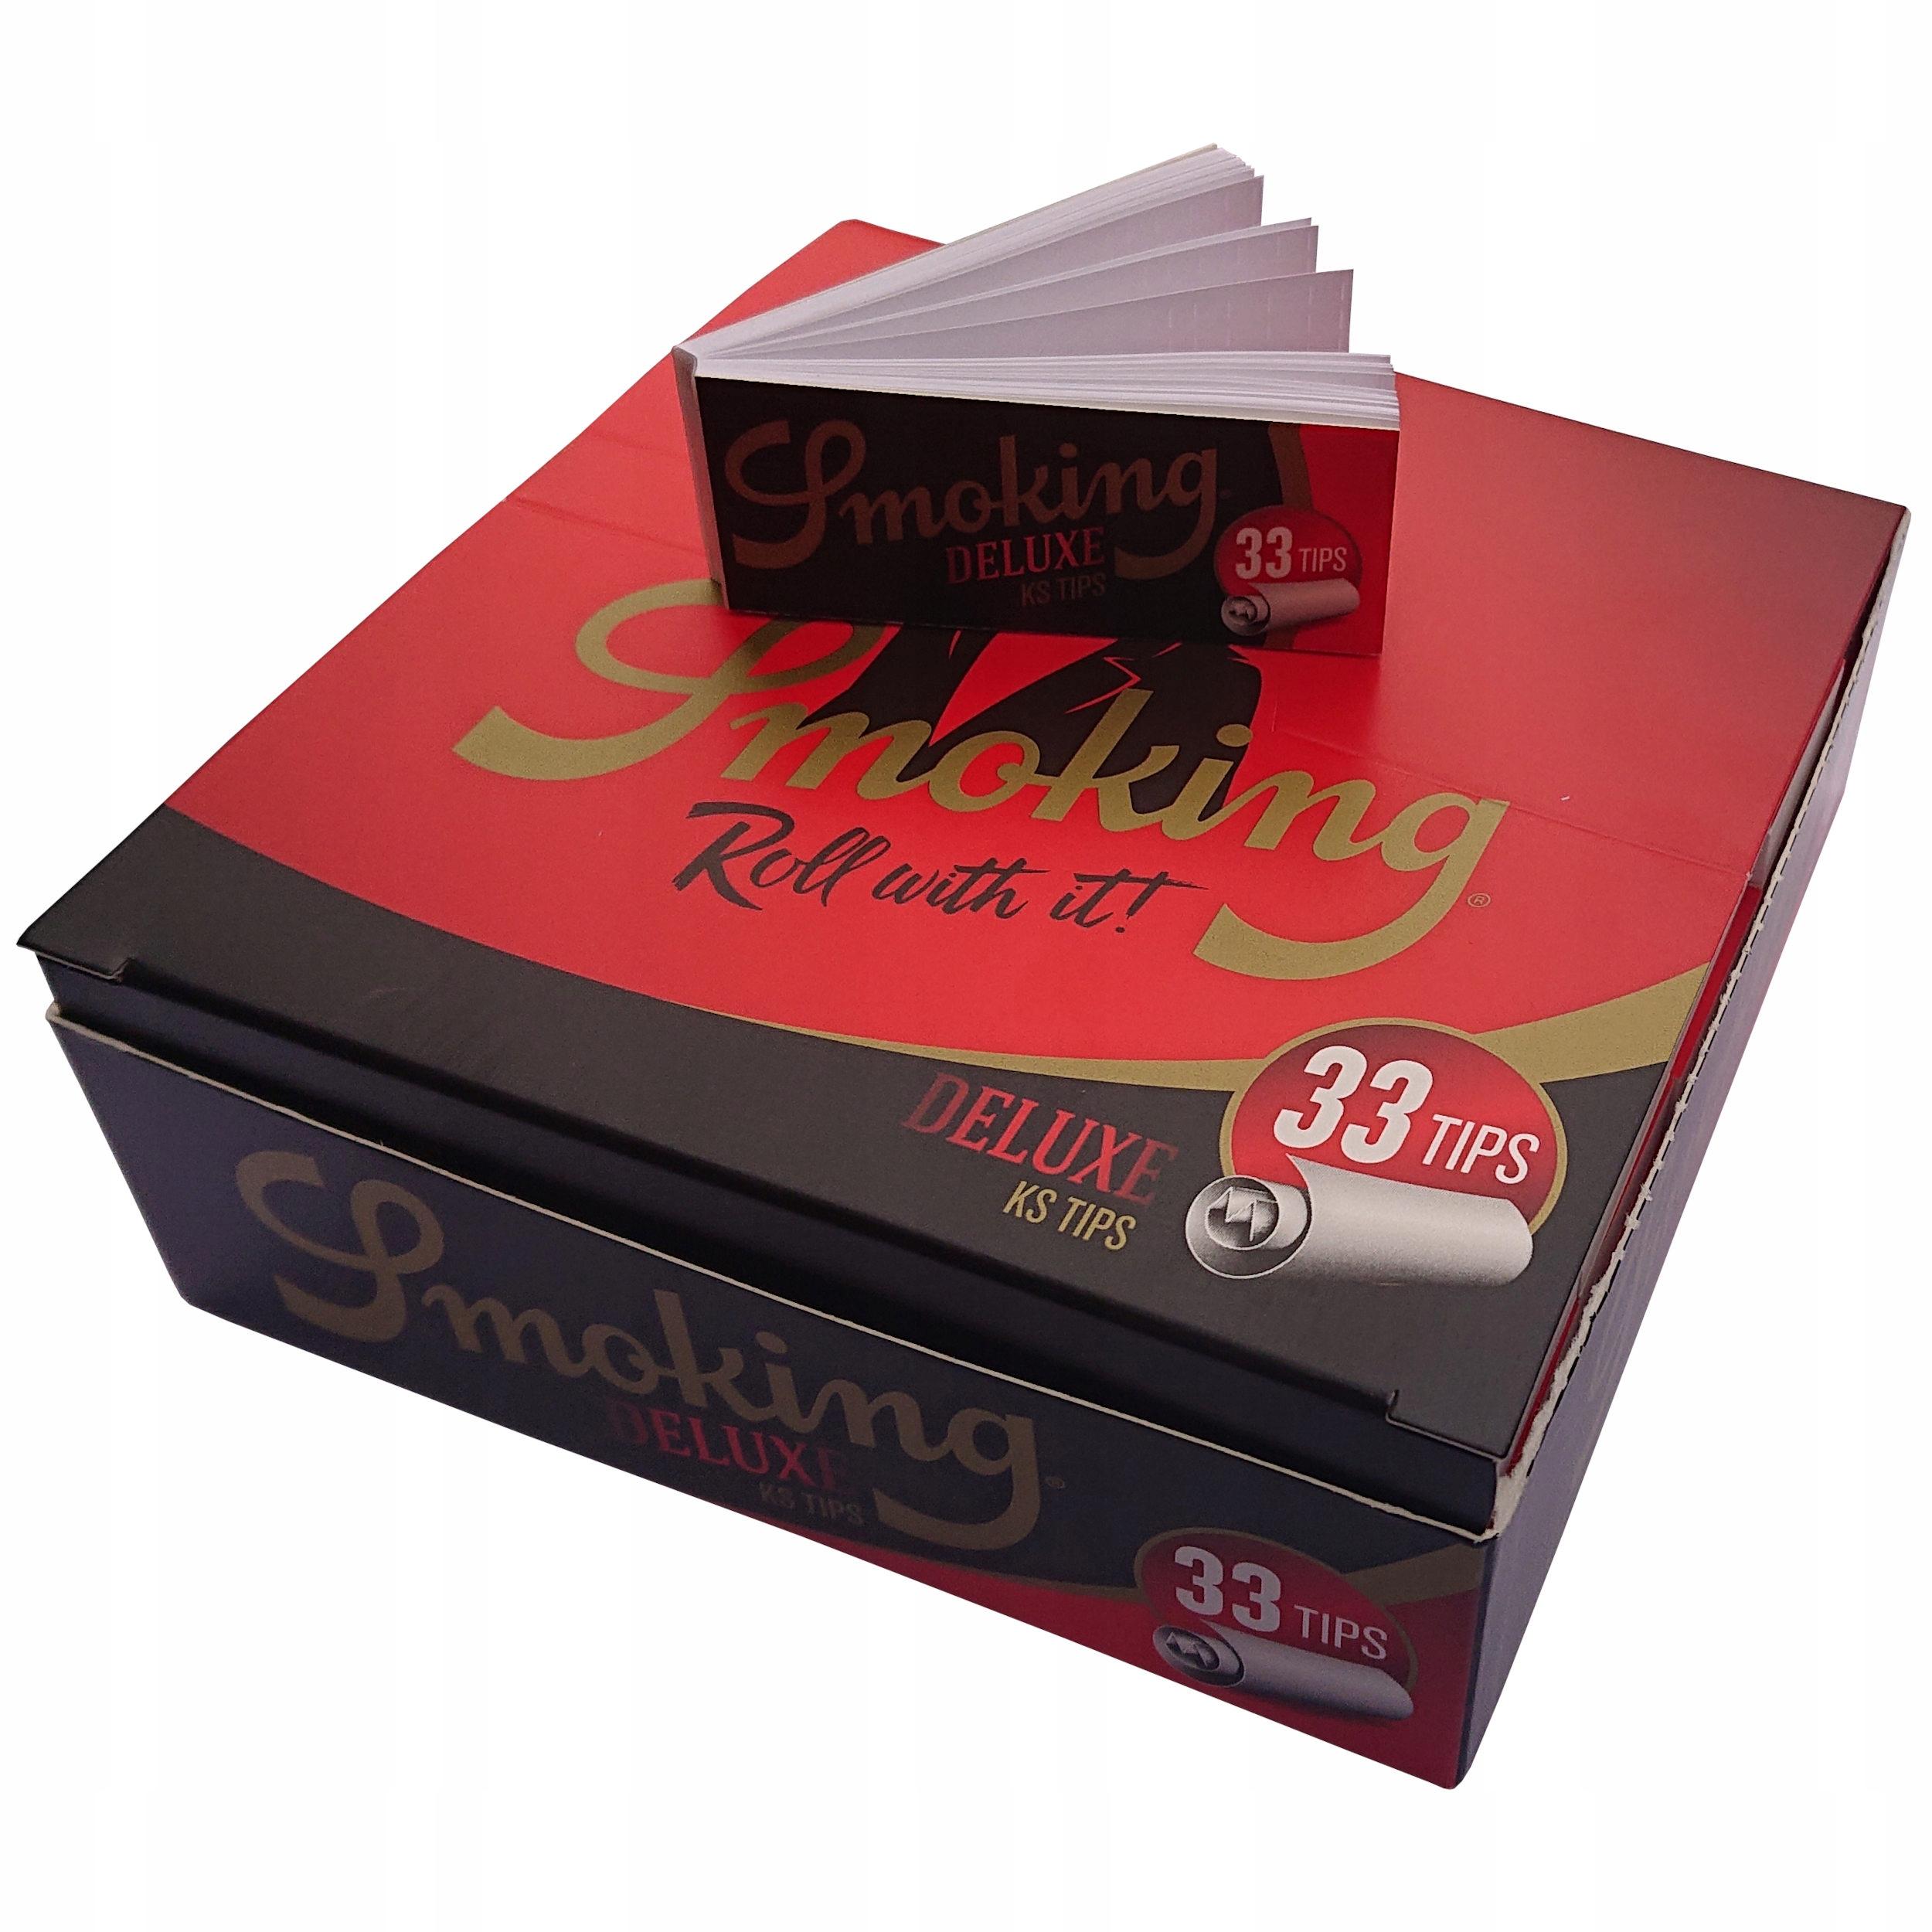 50 x Filtry Tipy Курительная бумага KS